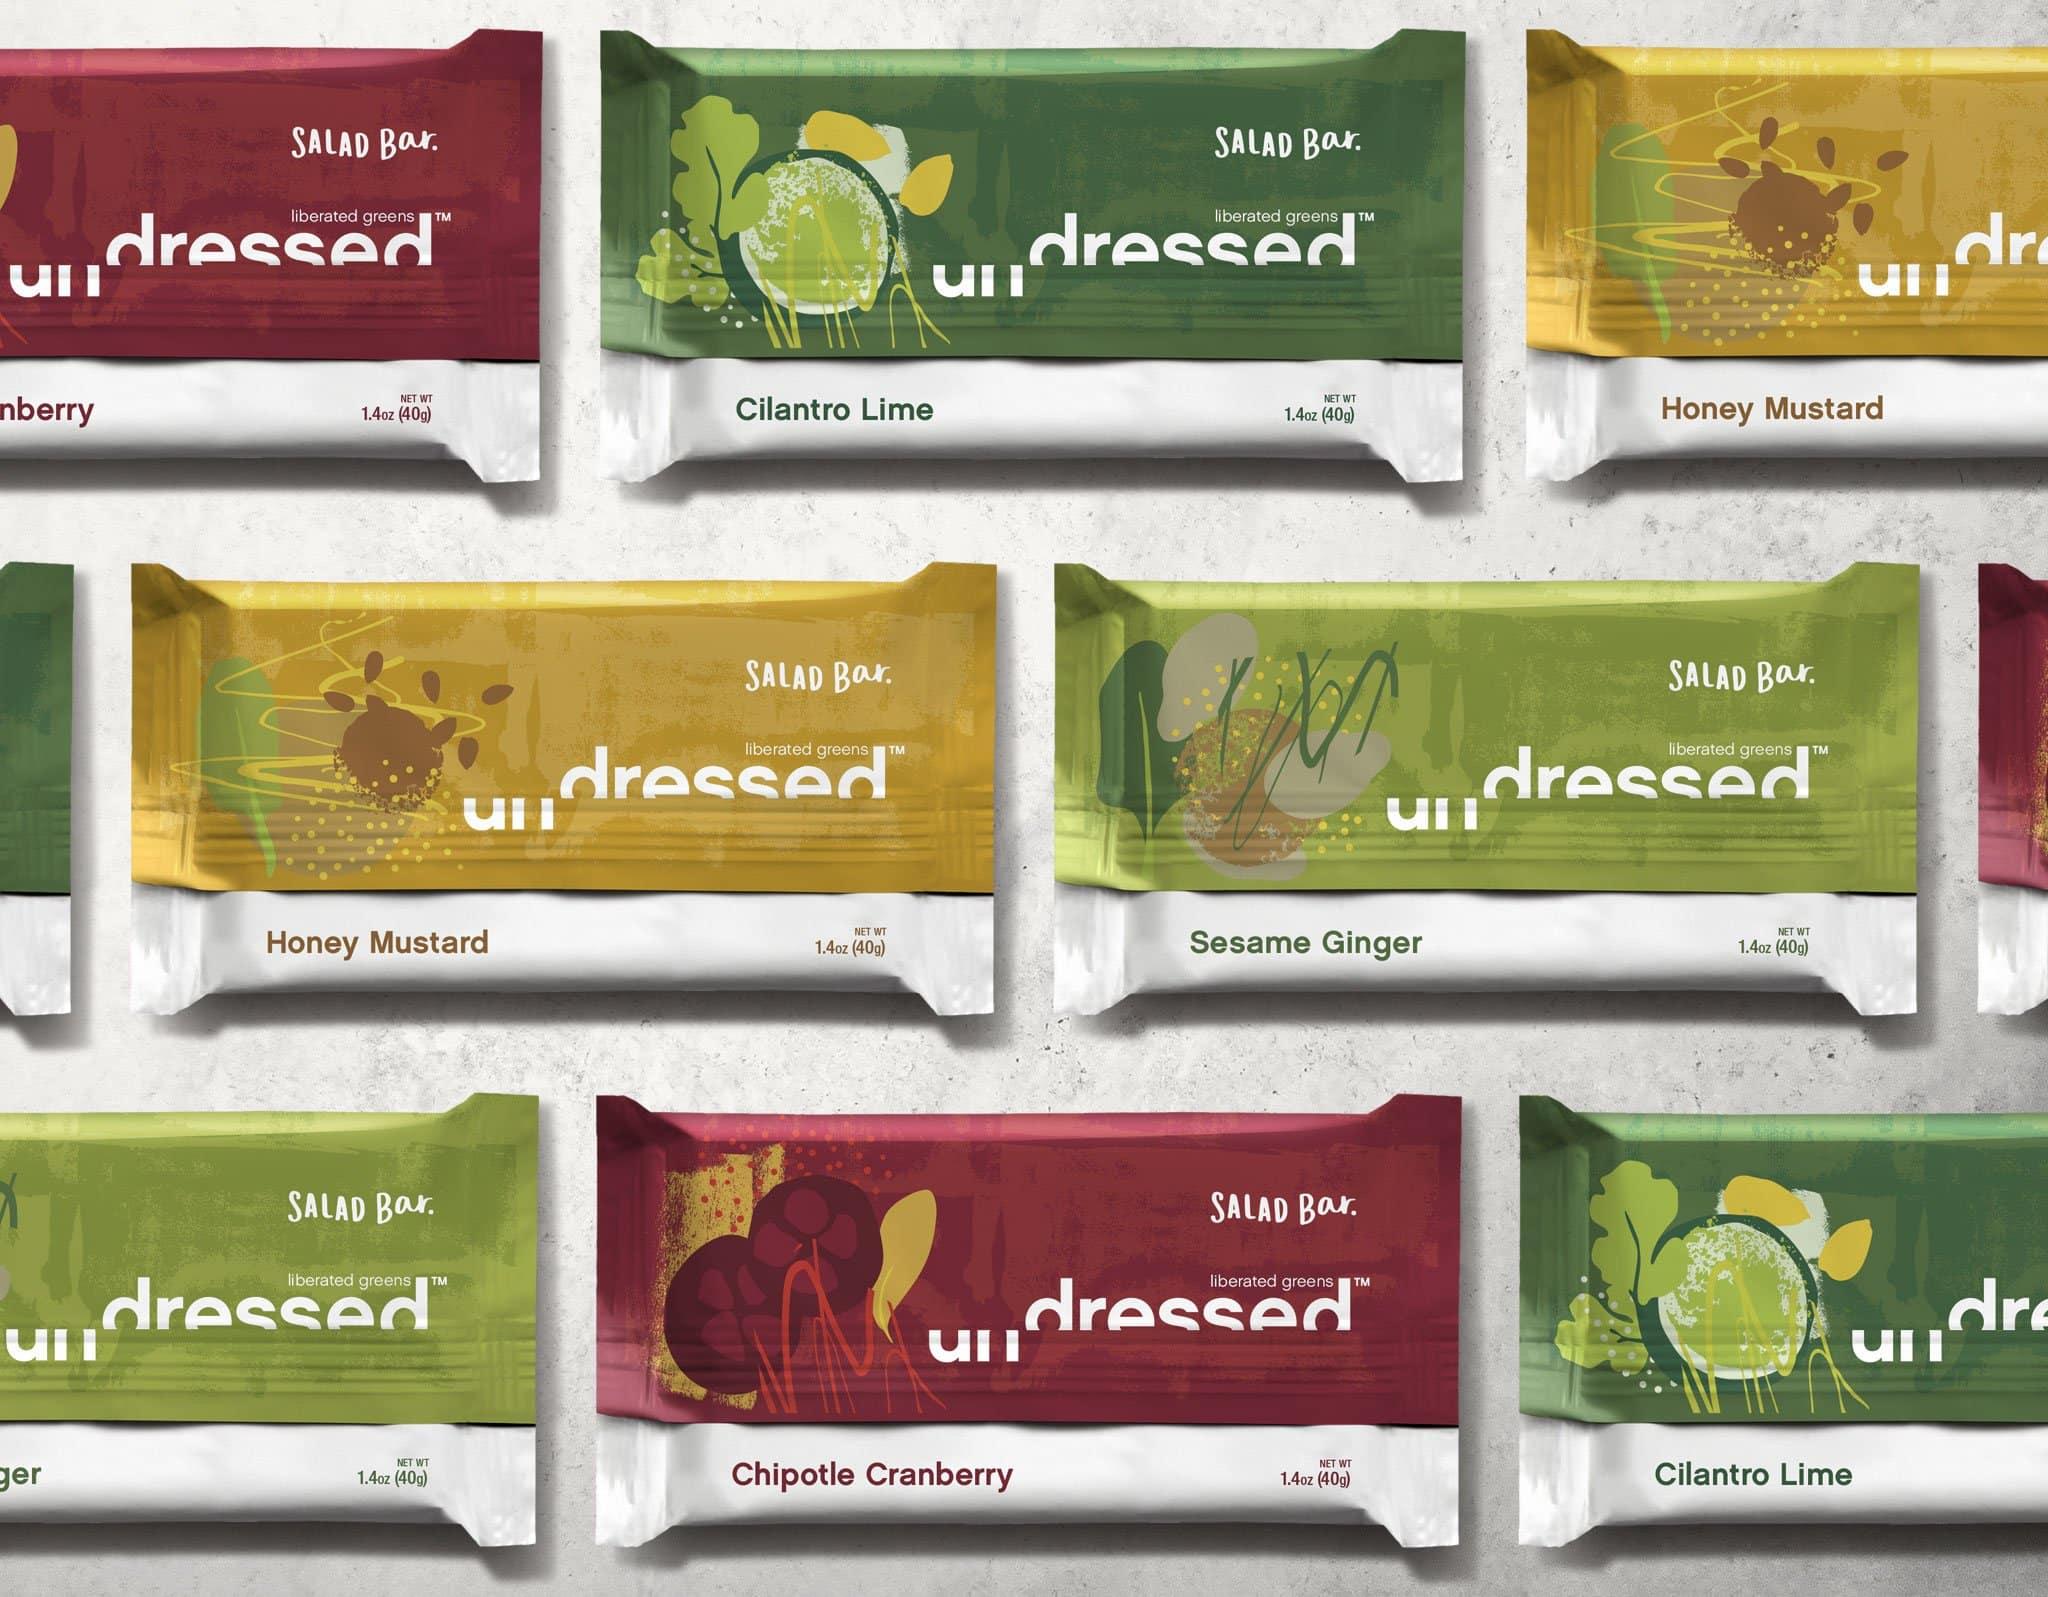 Undressed Bars